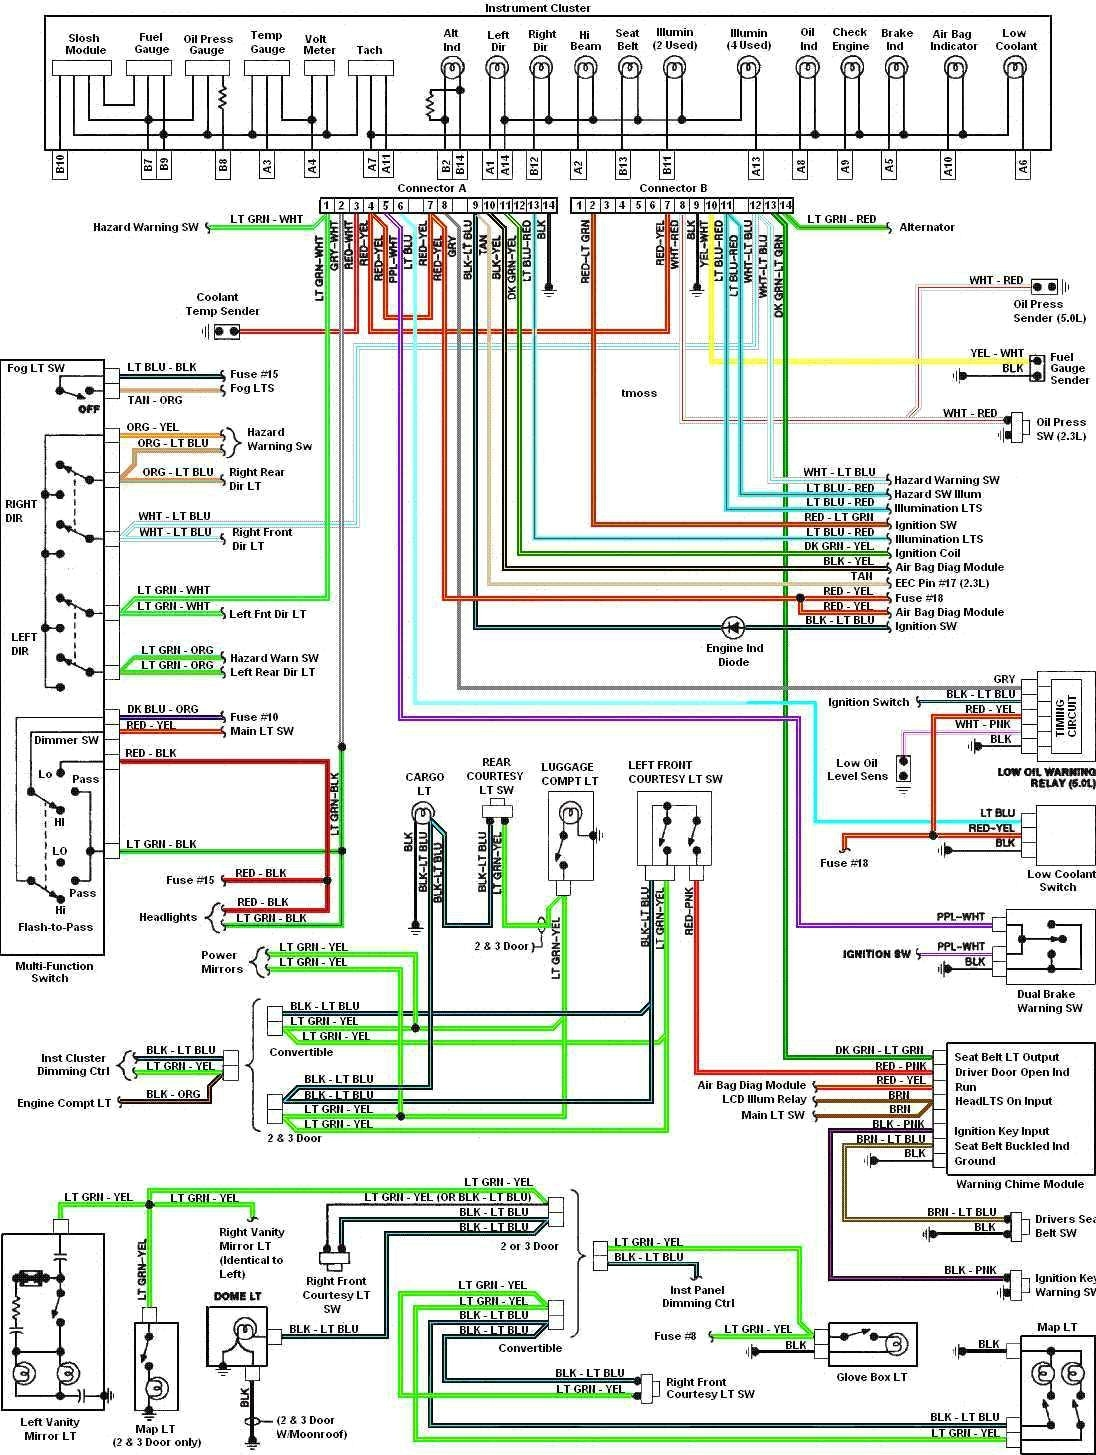 2004 Ford F350 Radio Wiring Diagram | save-list Wiring Diagram Models -  save-list.hoteldelmarlidodicamaiore.it | Ford F 350 Radio Wiring |  | Hotel del Mar a Lido di Camaiore